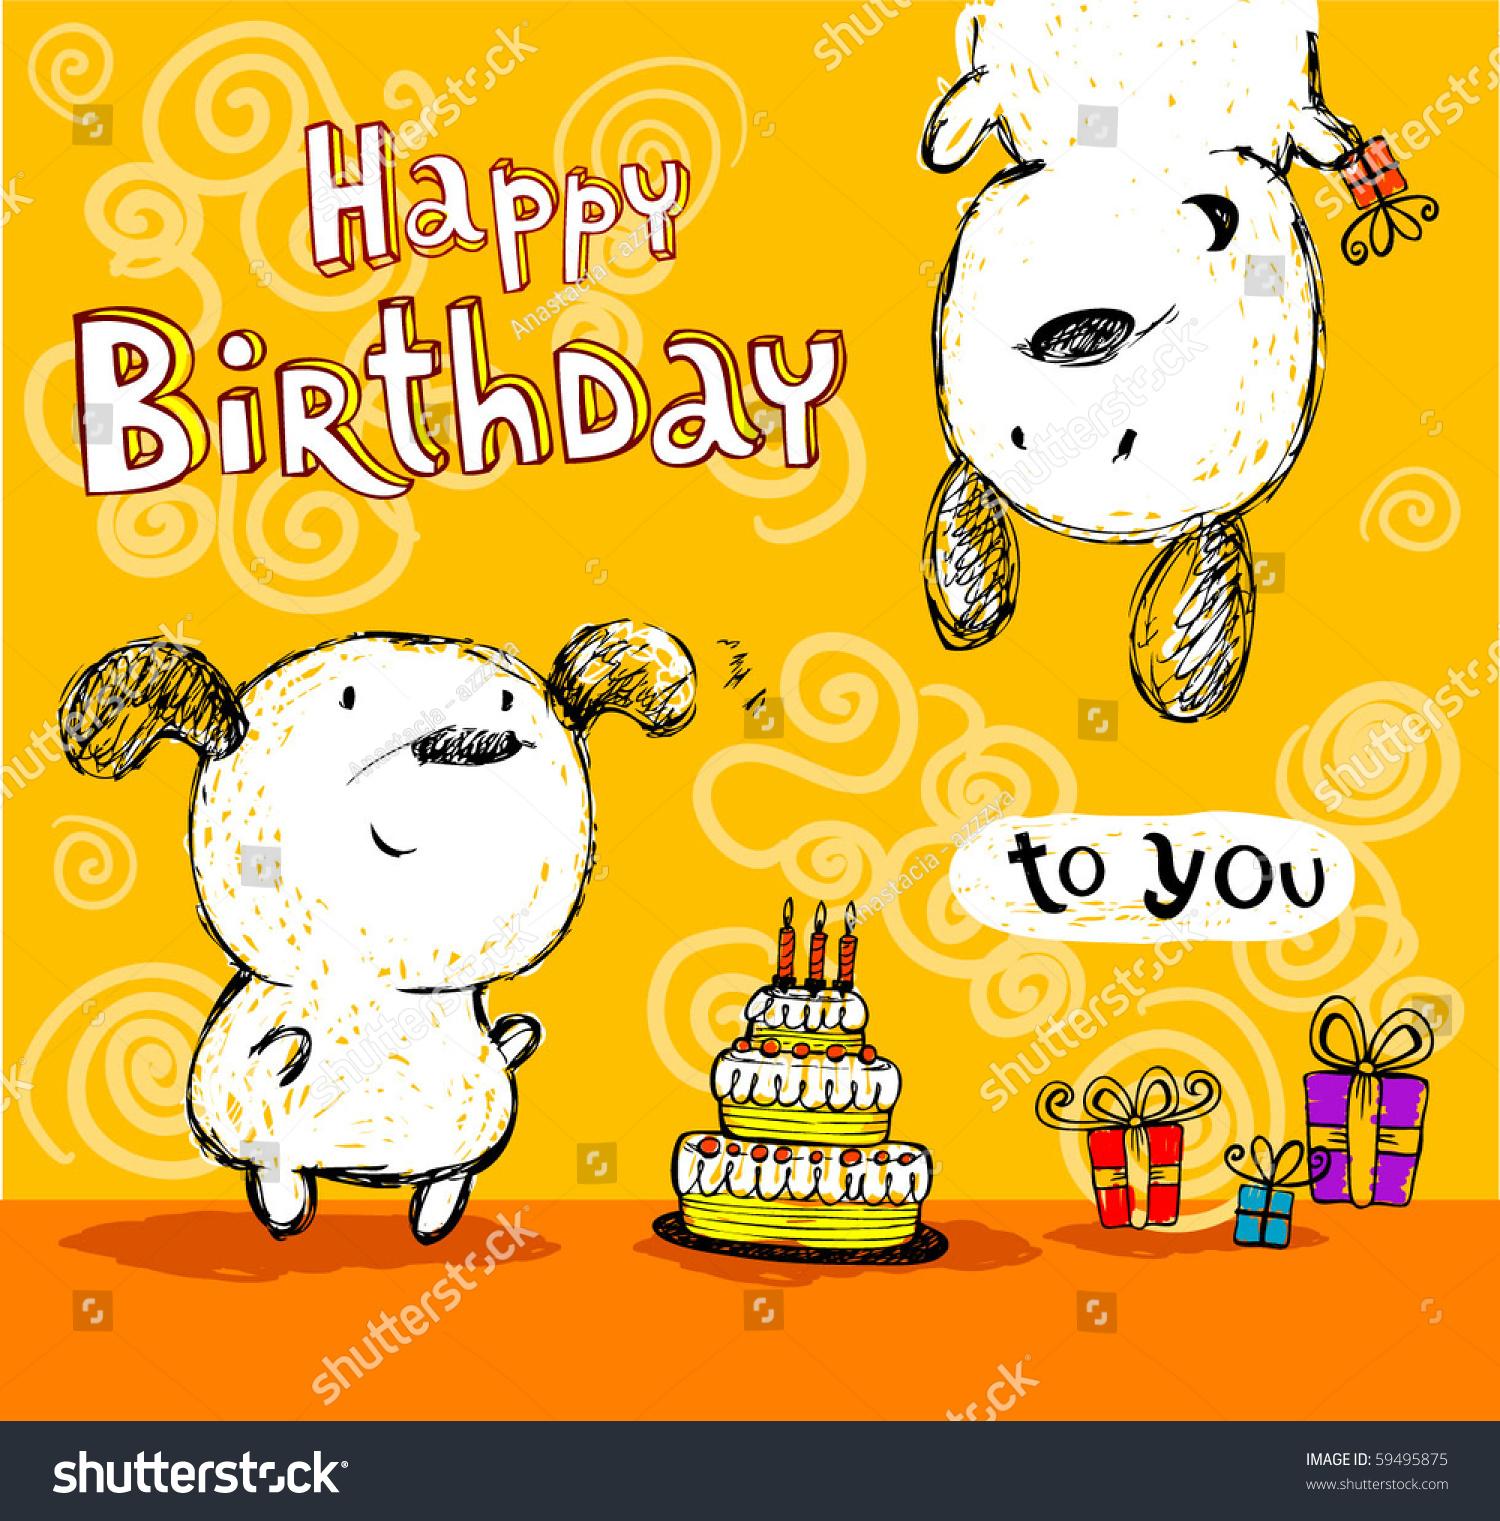 Birthday Card Friends Vector 59495875 Shutterstock – Birthday Card Friends